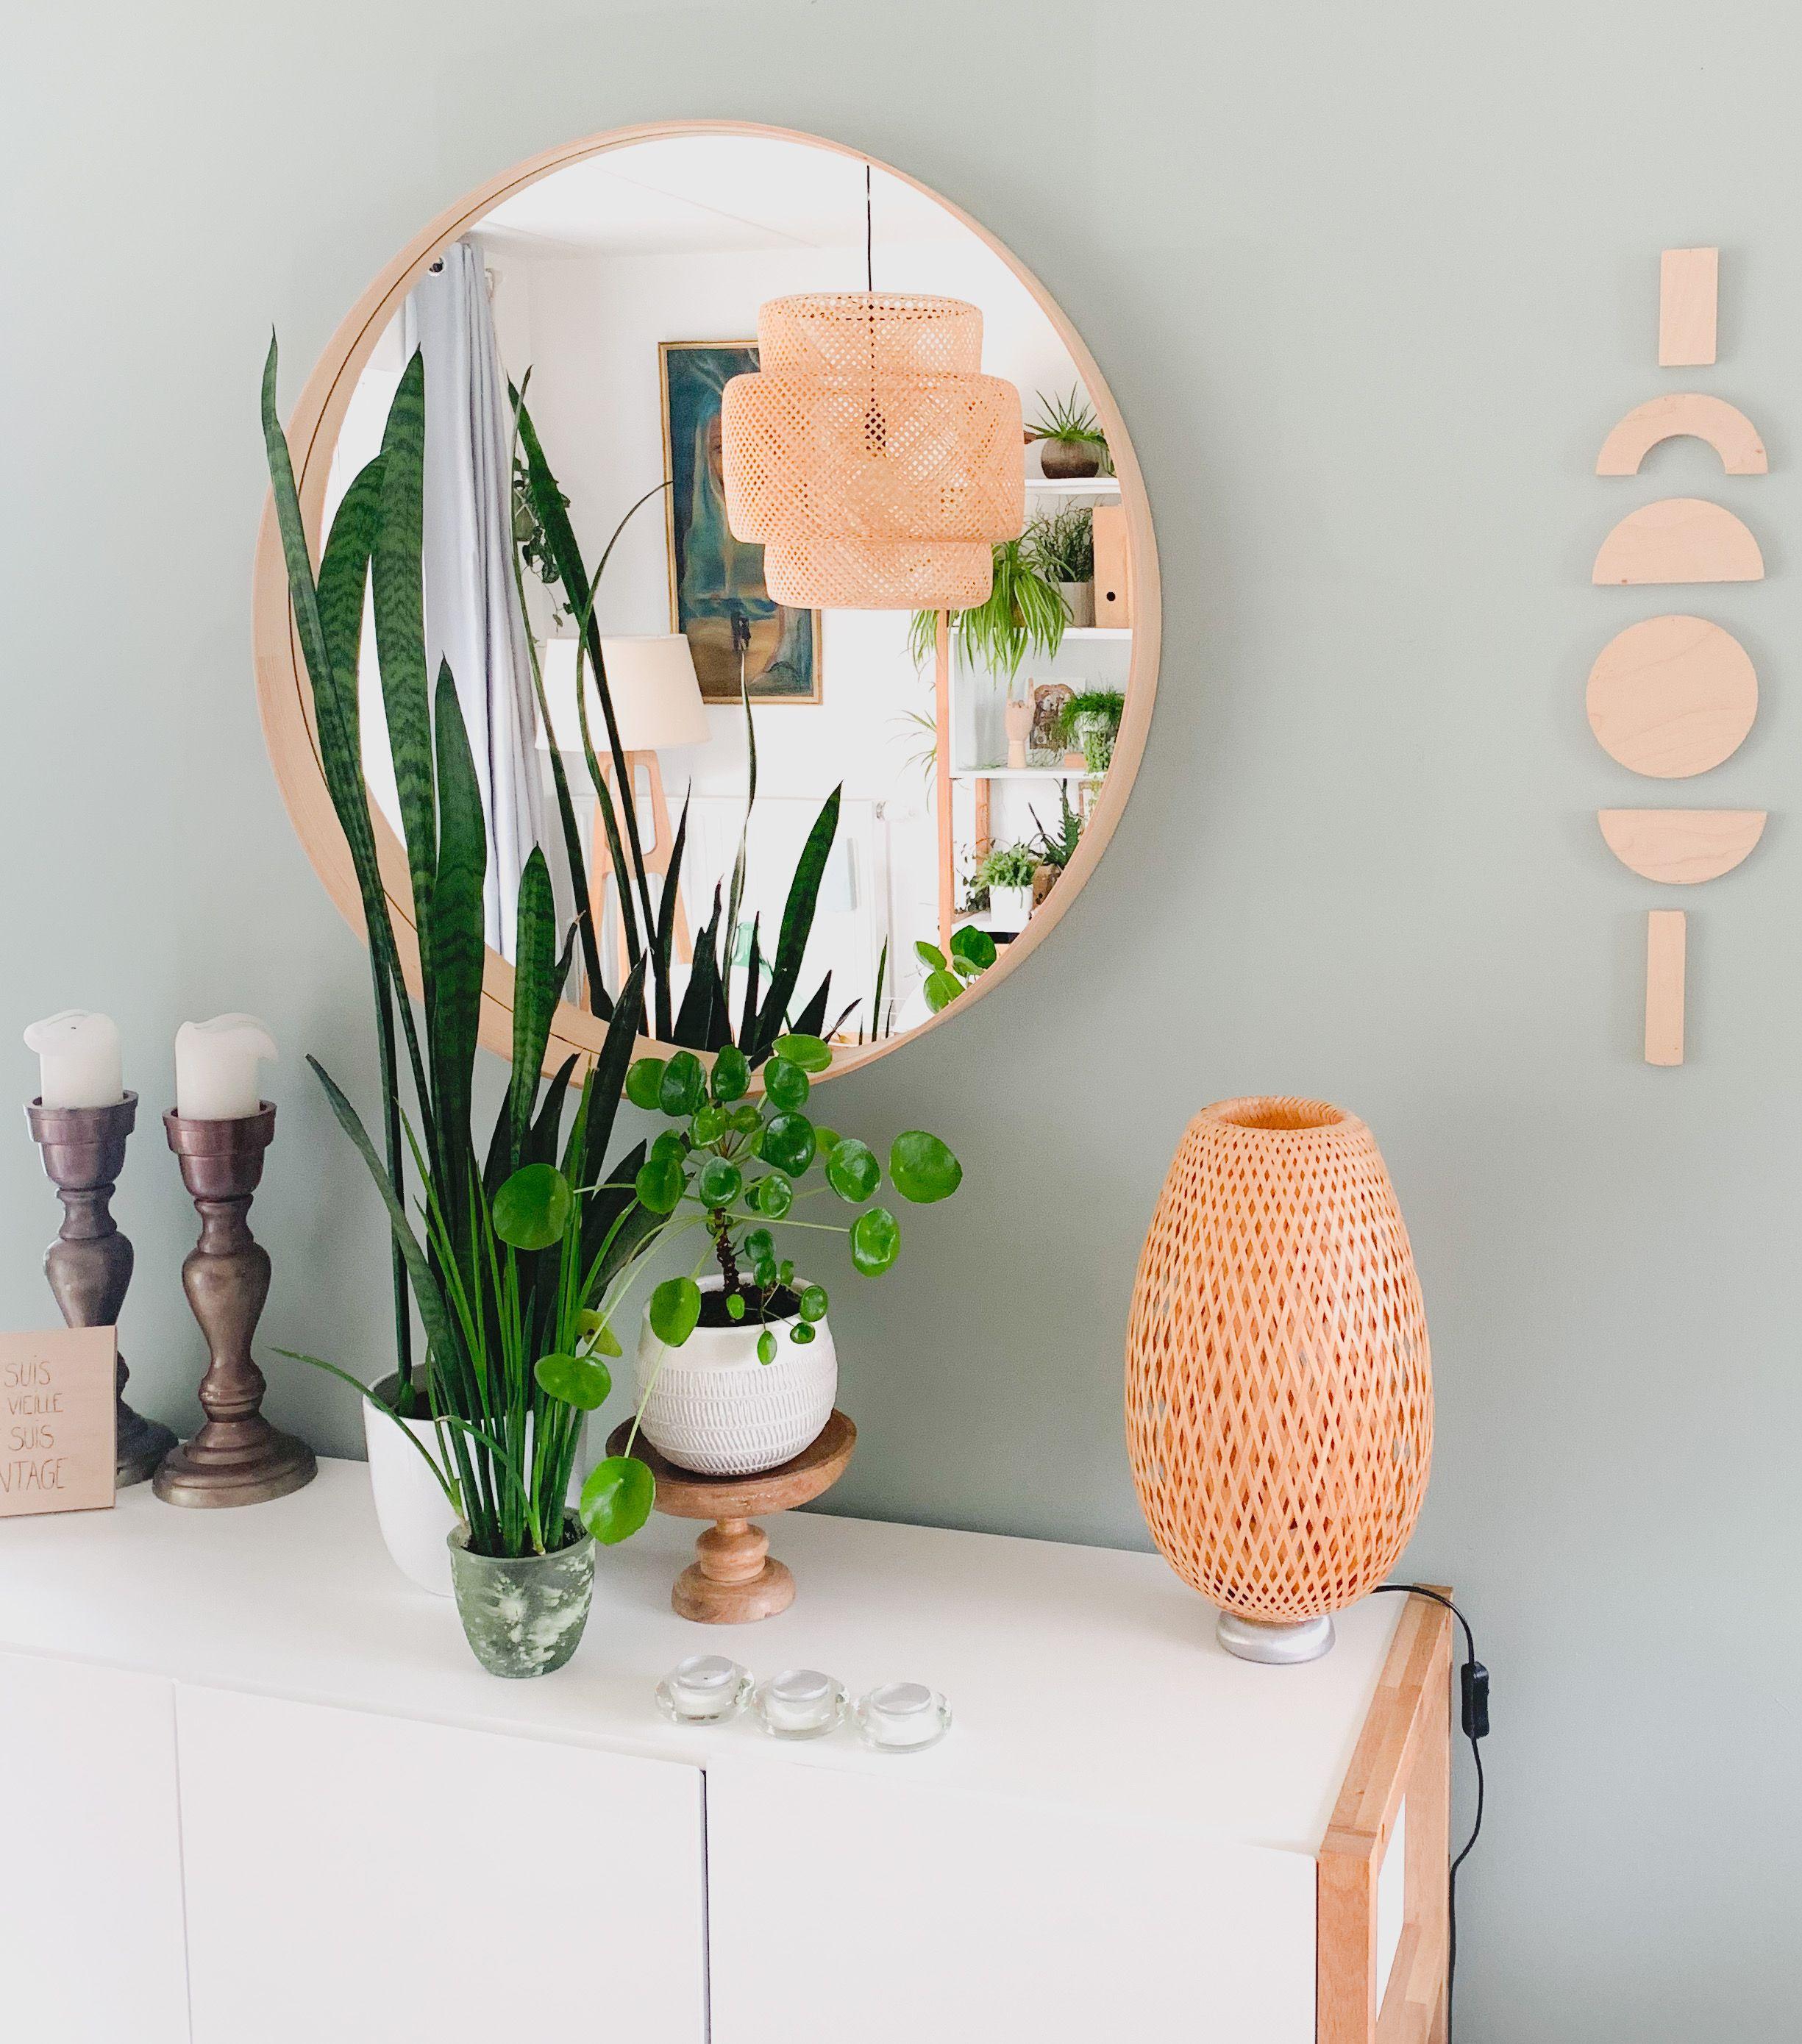 #decoration #wood #mirrordecor #plantesvertes #scandinaviandesign #slow #inspiration